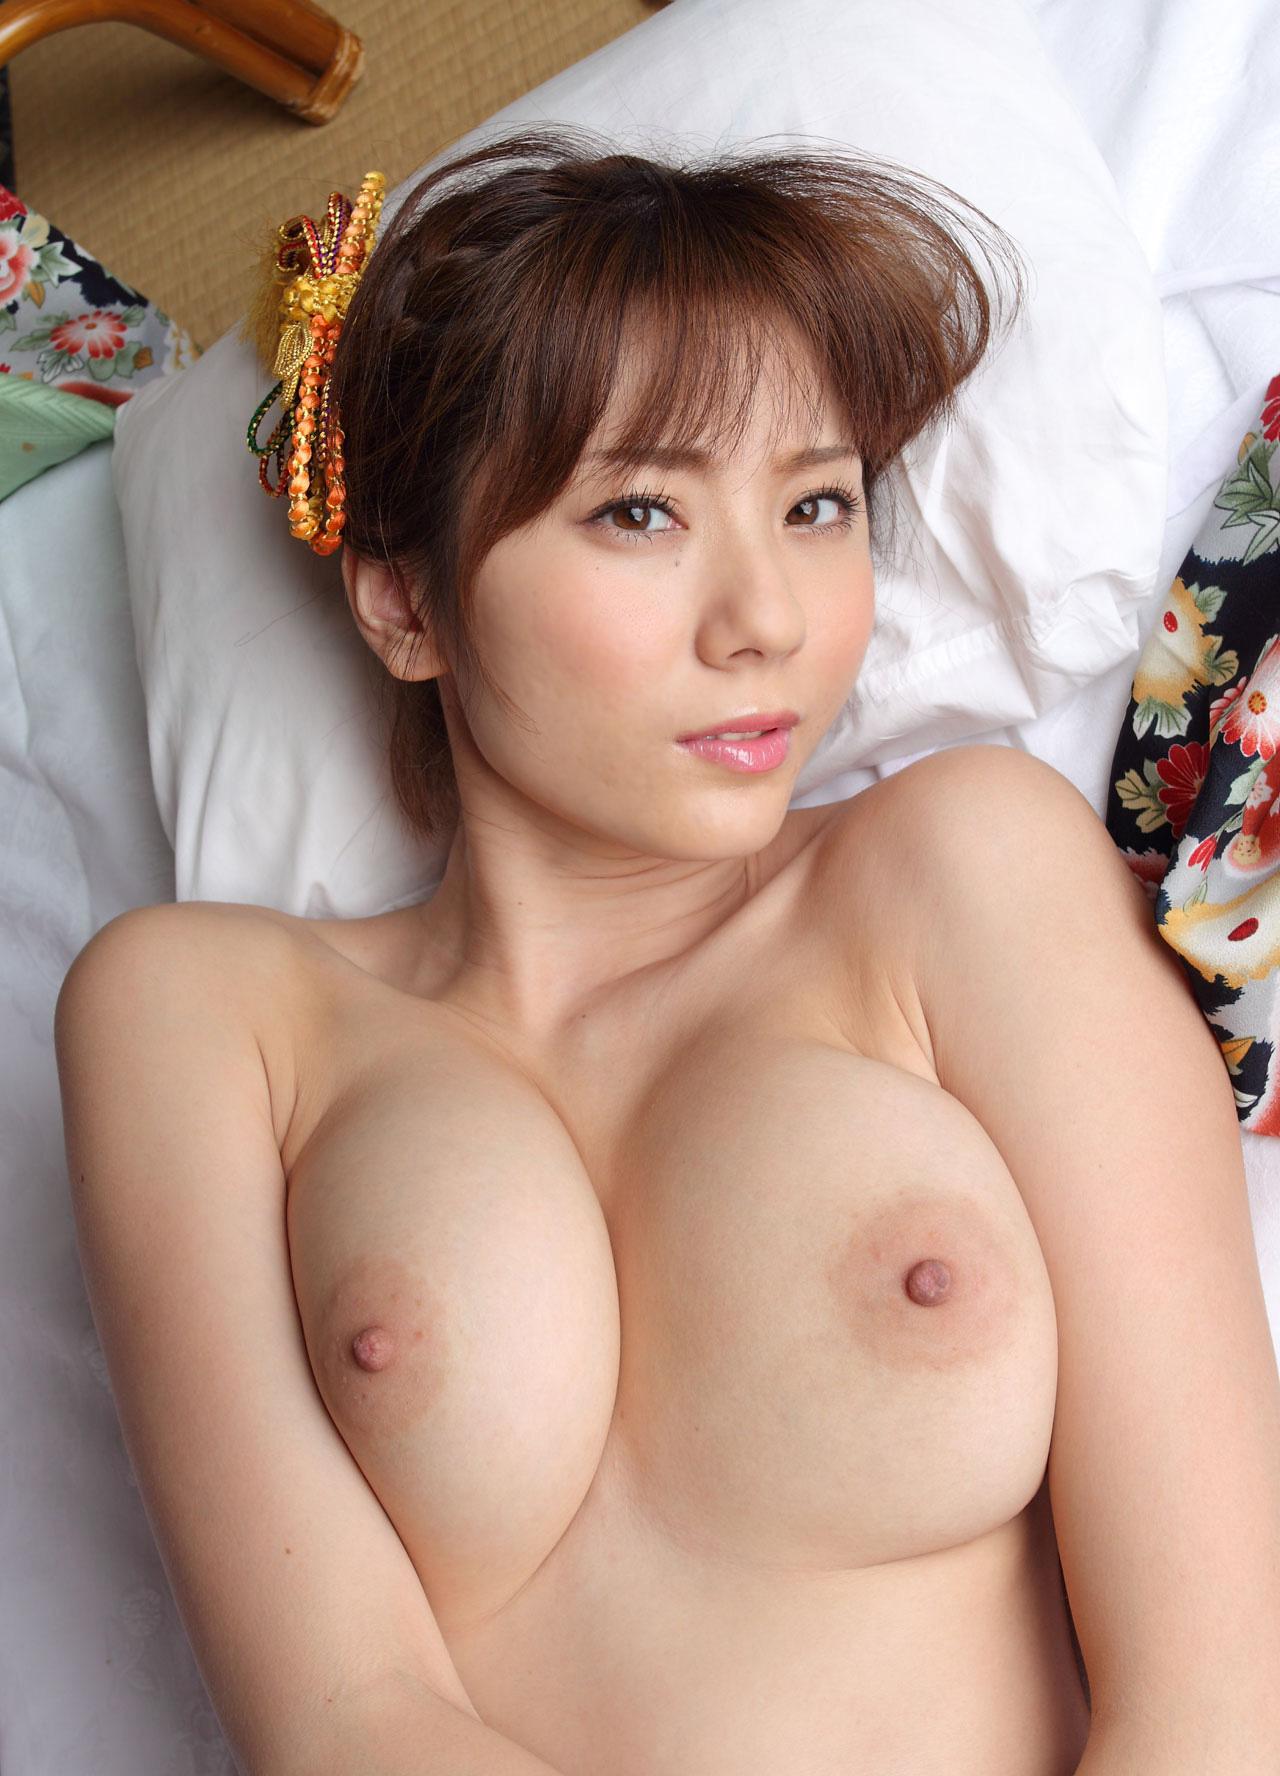 Hottest pornstar on earth